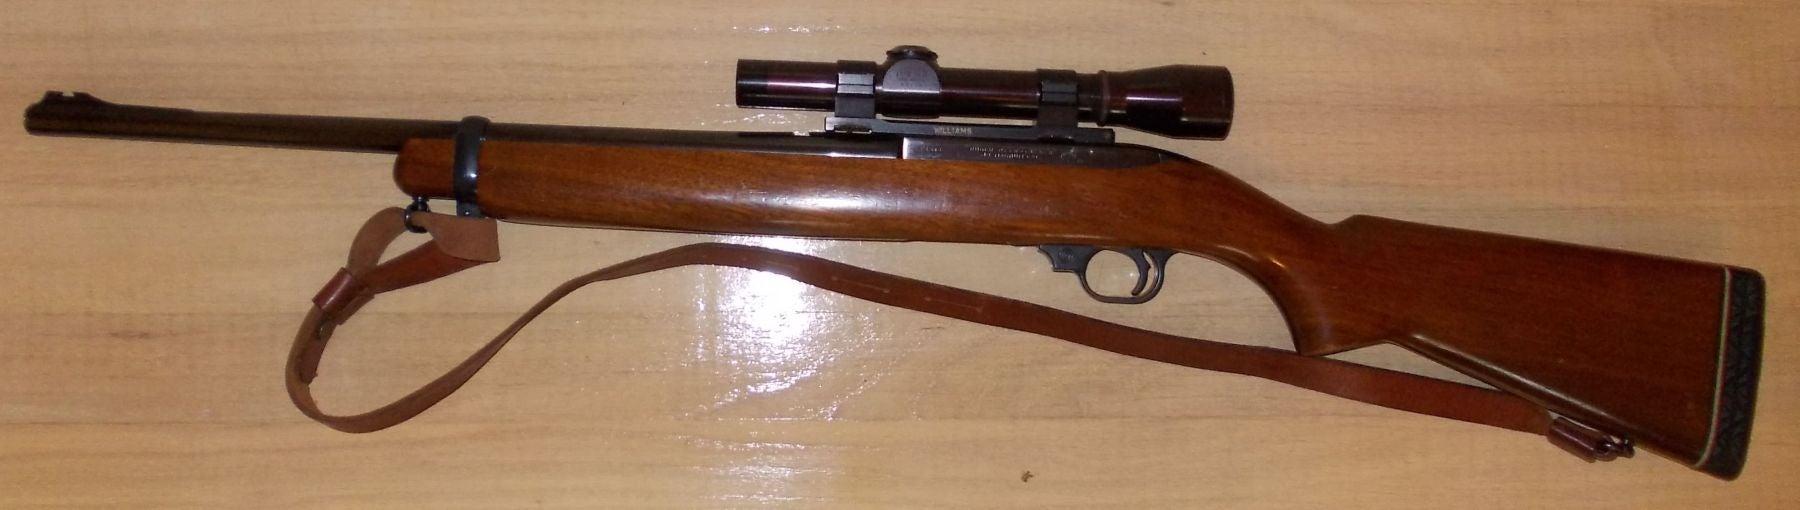 Ruger Deerstalker .44 magnum semiauto rifle, leupold scope